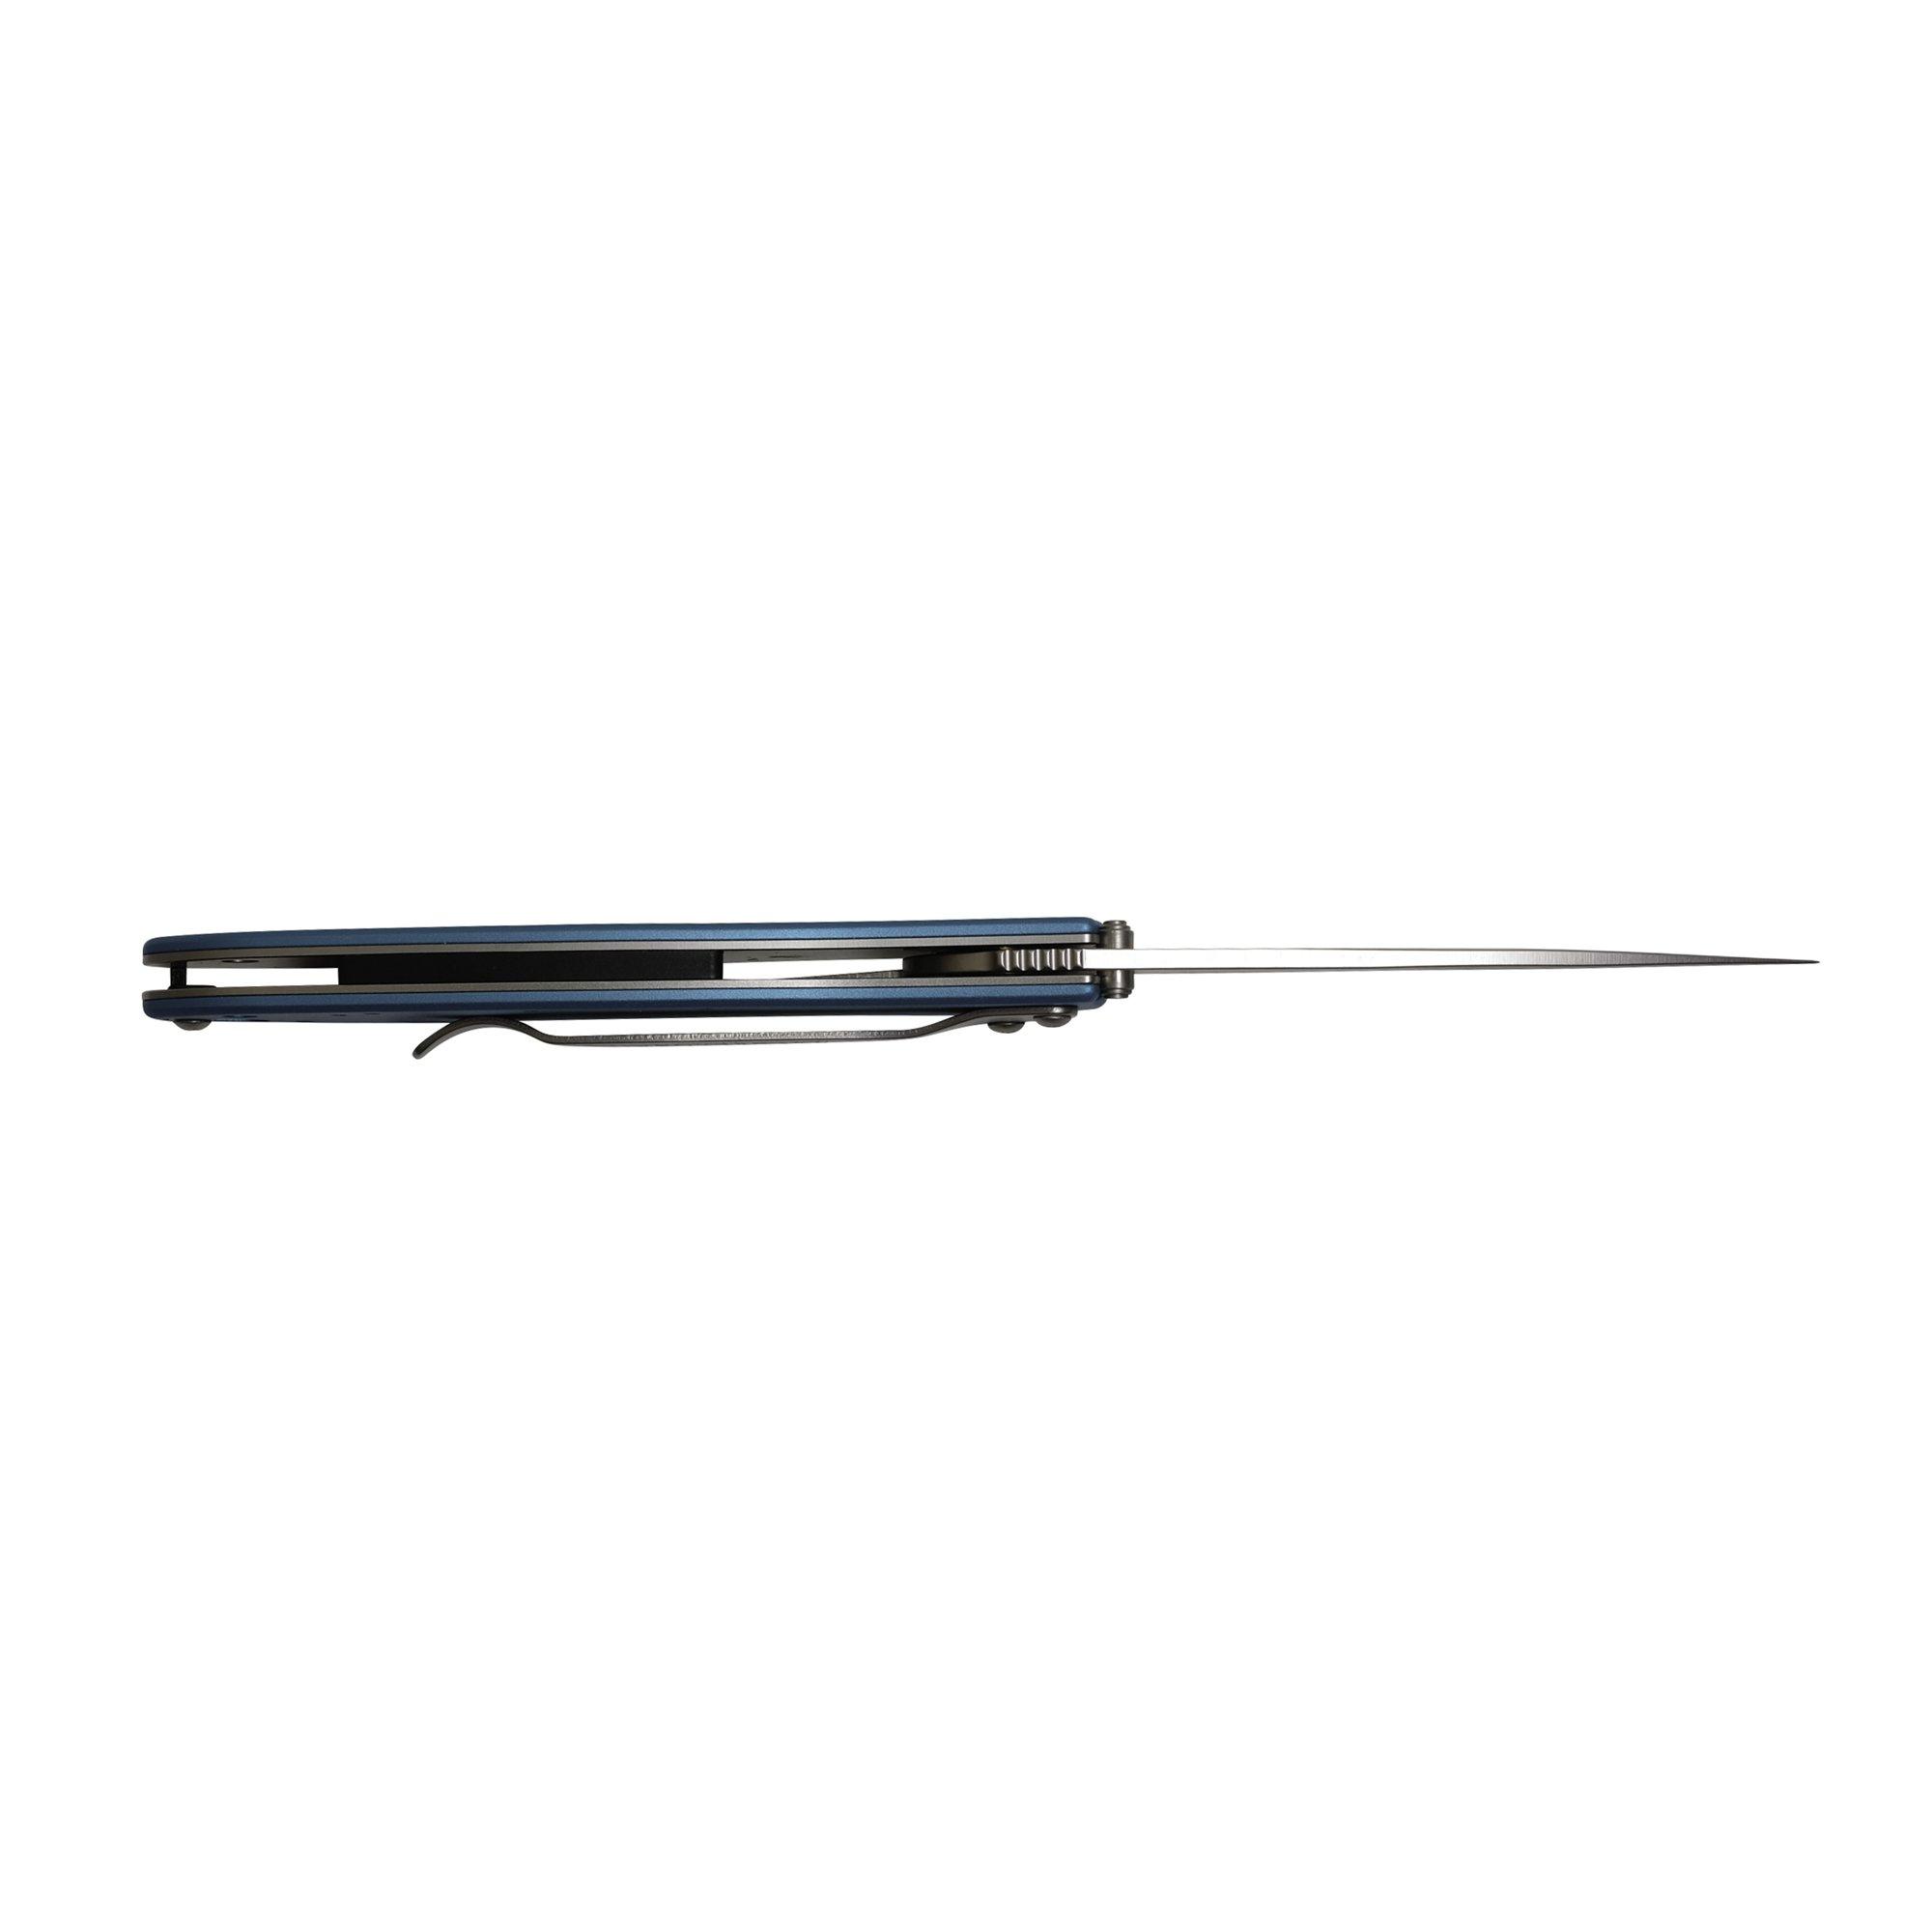 Kershaw Leek, Teal Pocket Knife (1660TEAL); 3'' Bead-Blasted High-Performance Sandvik 14C28N Steel Blade, Teal Anodized Aluminum Handle, SpeedSafe Assisted Opening, Liner Lock, Tip-Lock Slider; 2.4 OZ by Kershaw (Image #6)